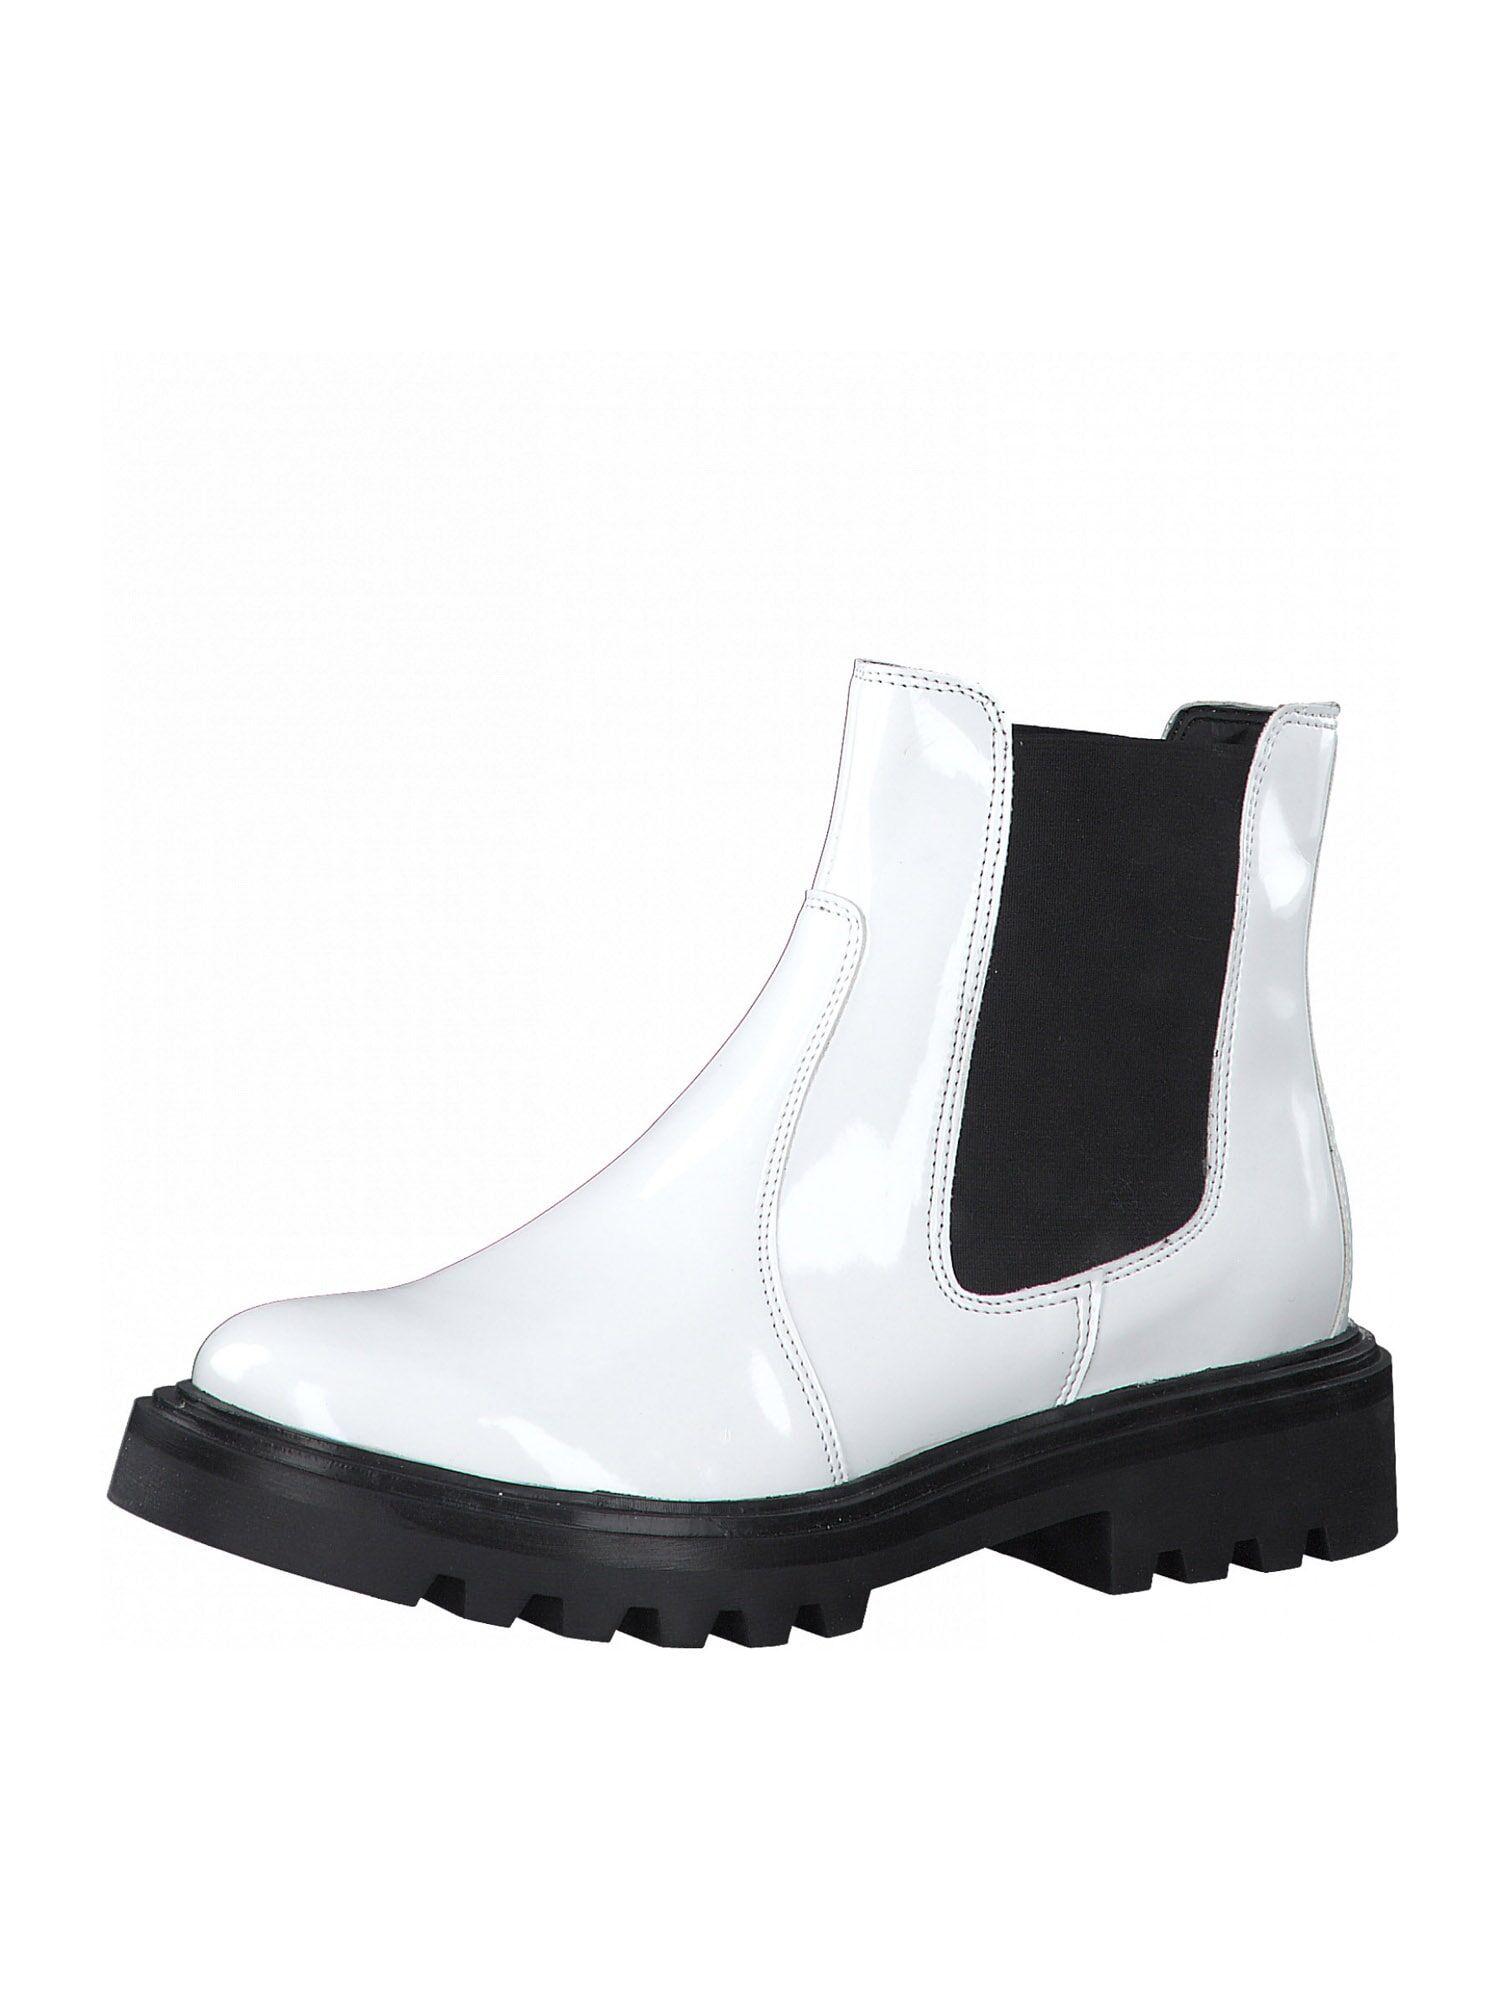 TAMARIS Chelsea Boots  - Blanc - Taille: 40 - female